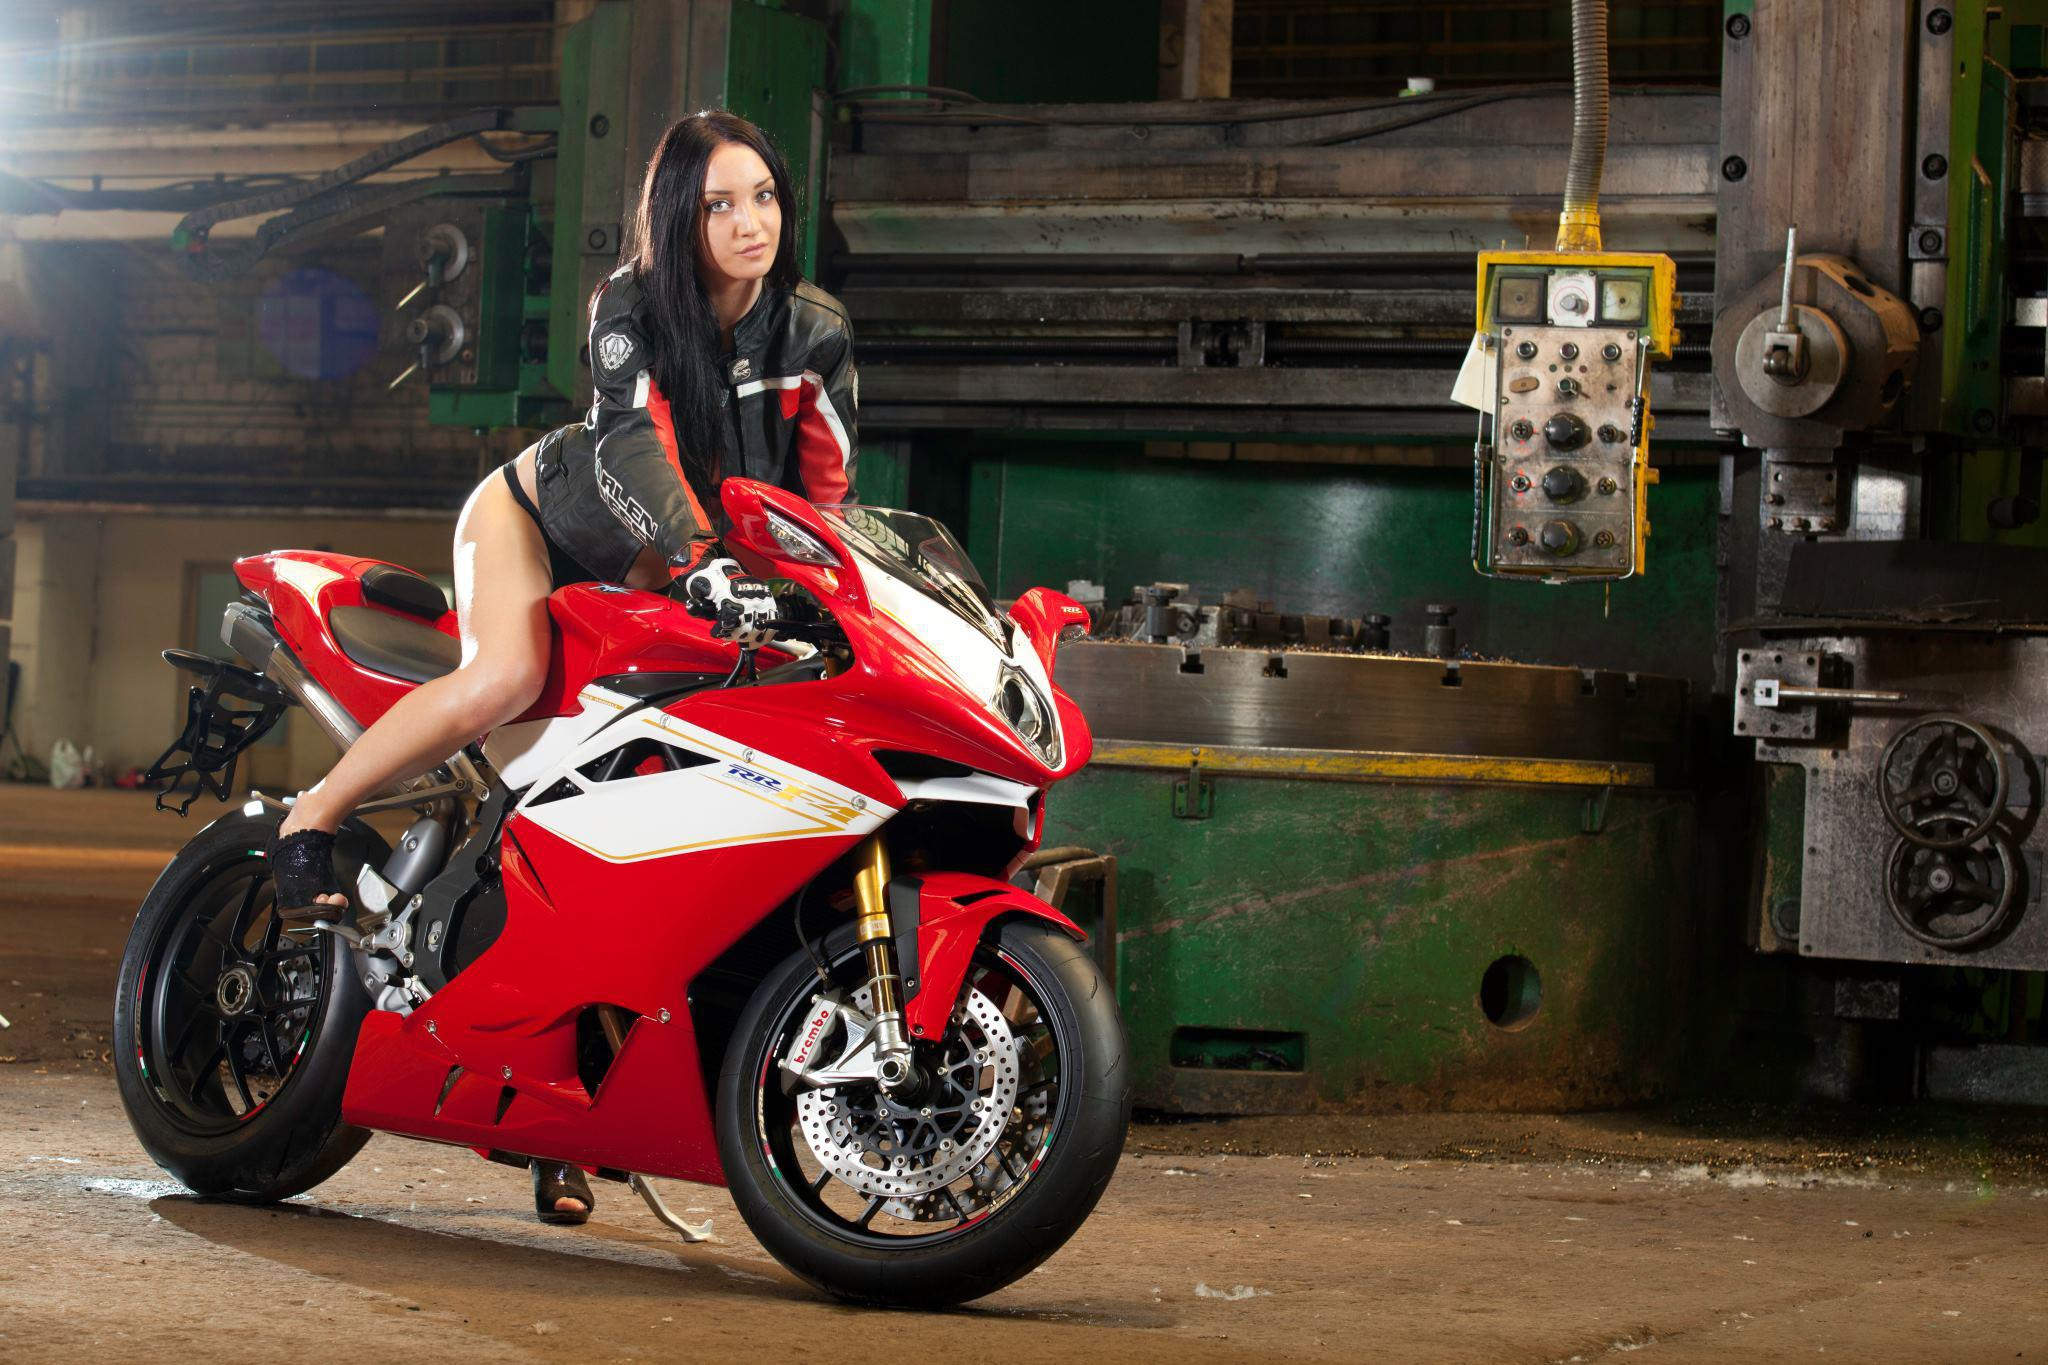 hot-girls-and-sport-bike